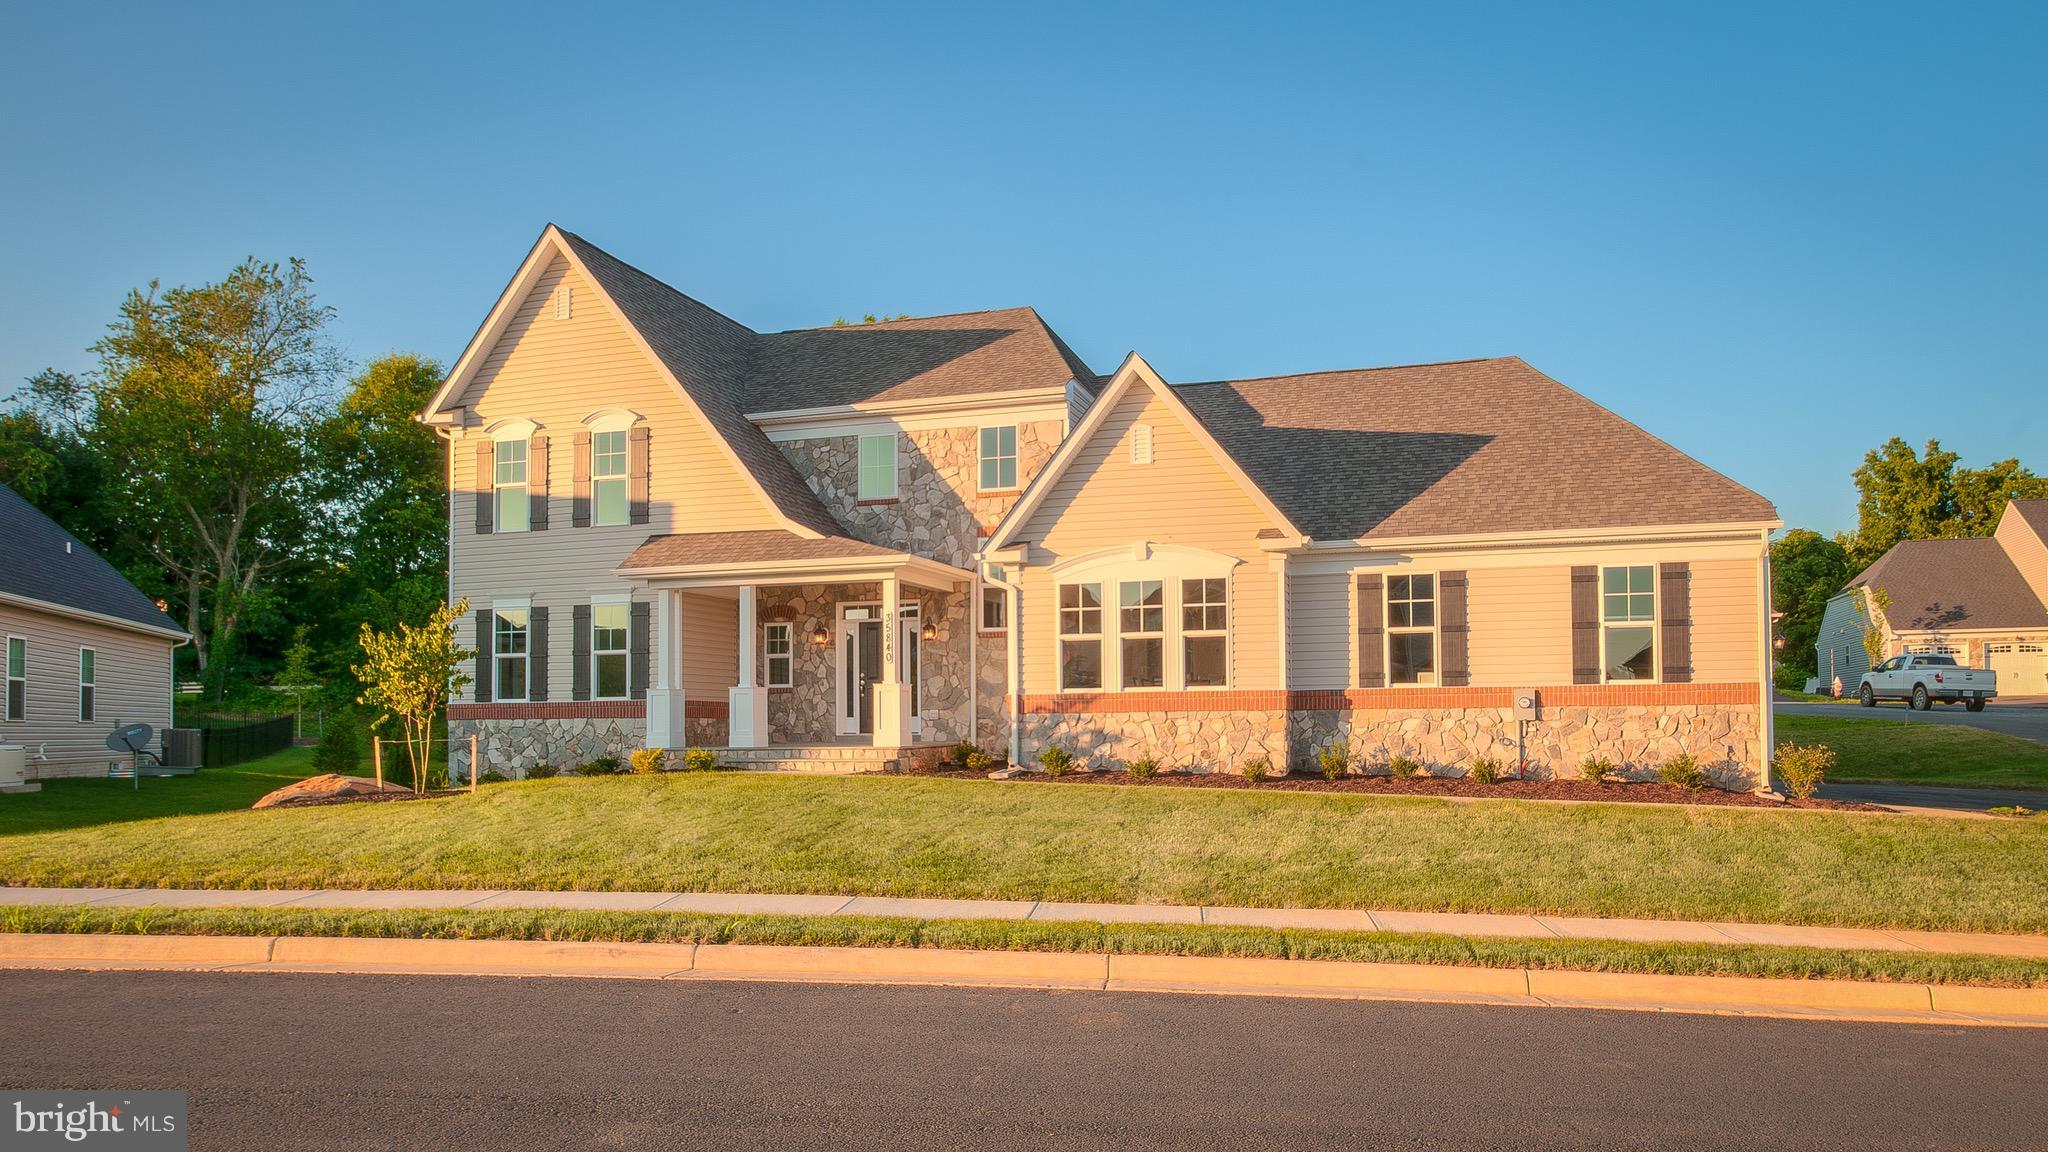 35840 LILY MILL LANE, ROUND HILL, VA 20141